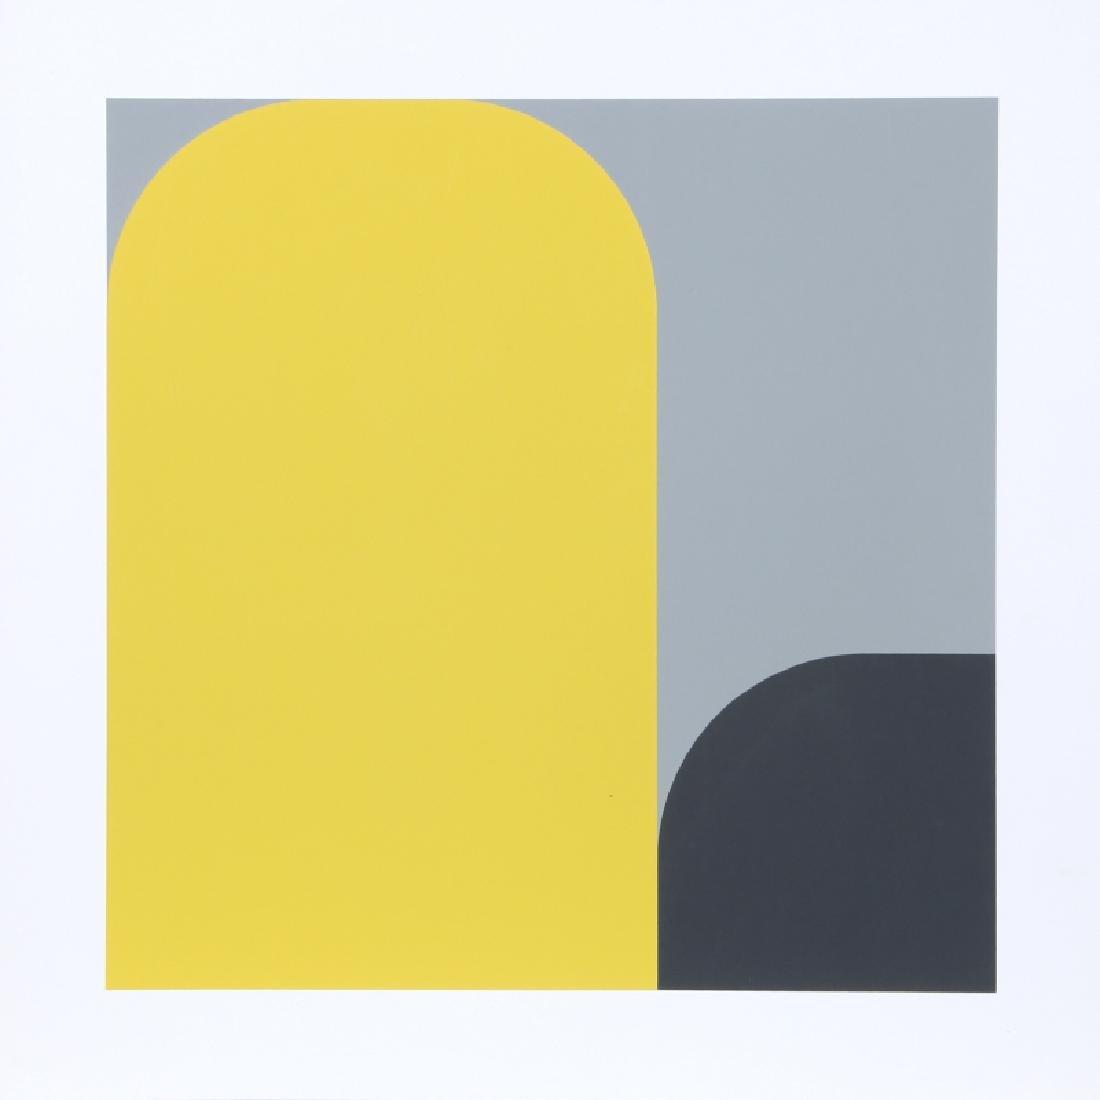 Kaspar Thomas Lenk, Untitled II, Screenprint